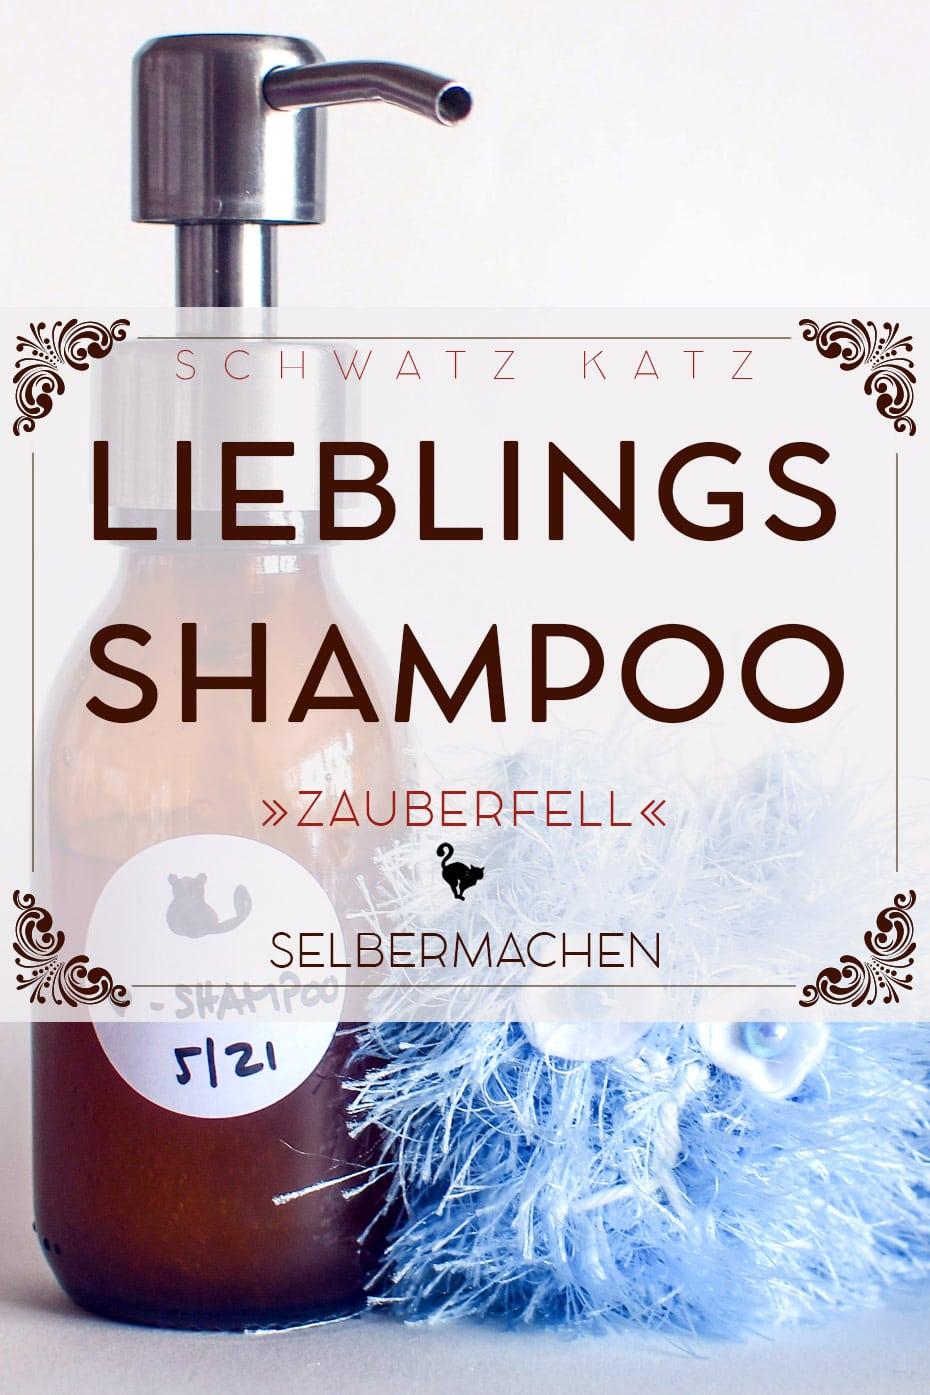 Selbstgemachtes Lieblingsshampoo »Zauberfell« | Schwatz Katz